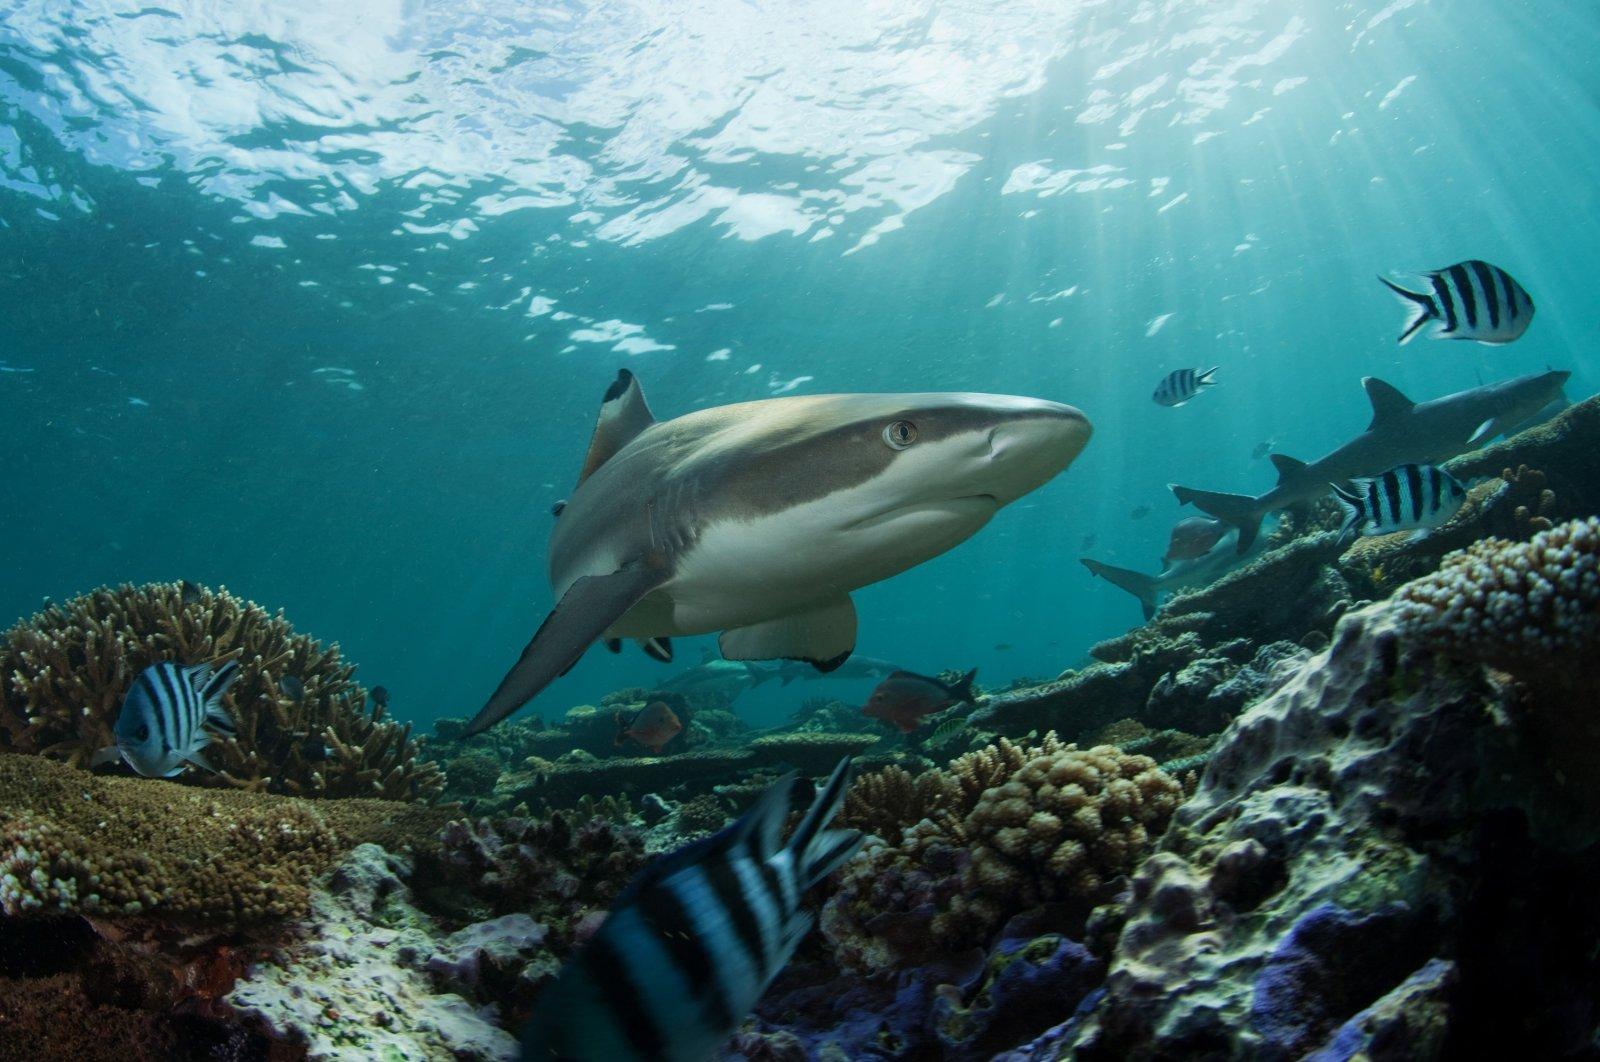 A reef shark in an undated photo. (Shutterstock Photo)